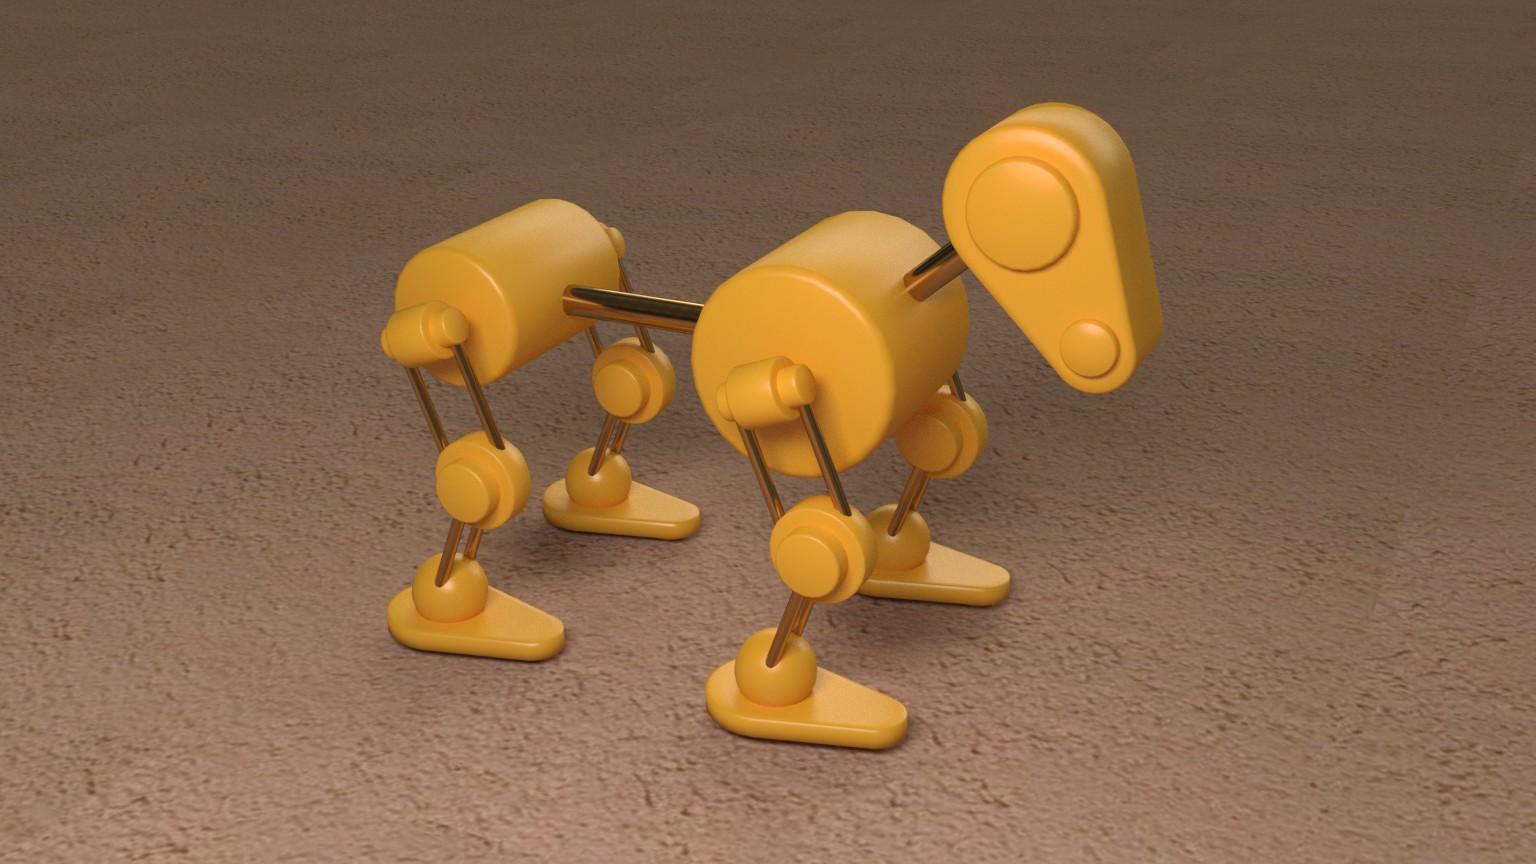 Robot_perro-robot_perro1.jpg